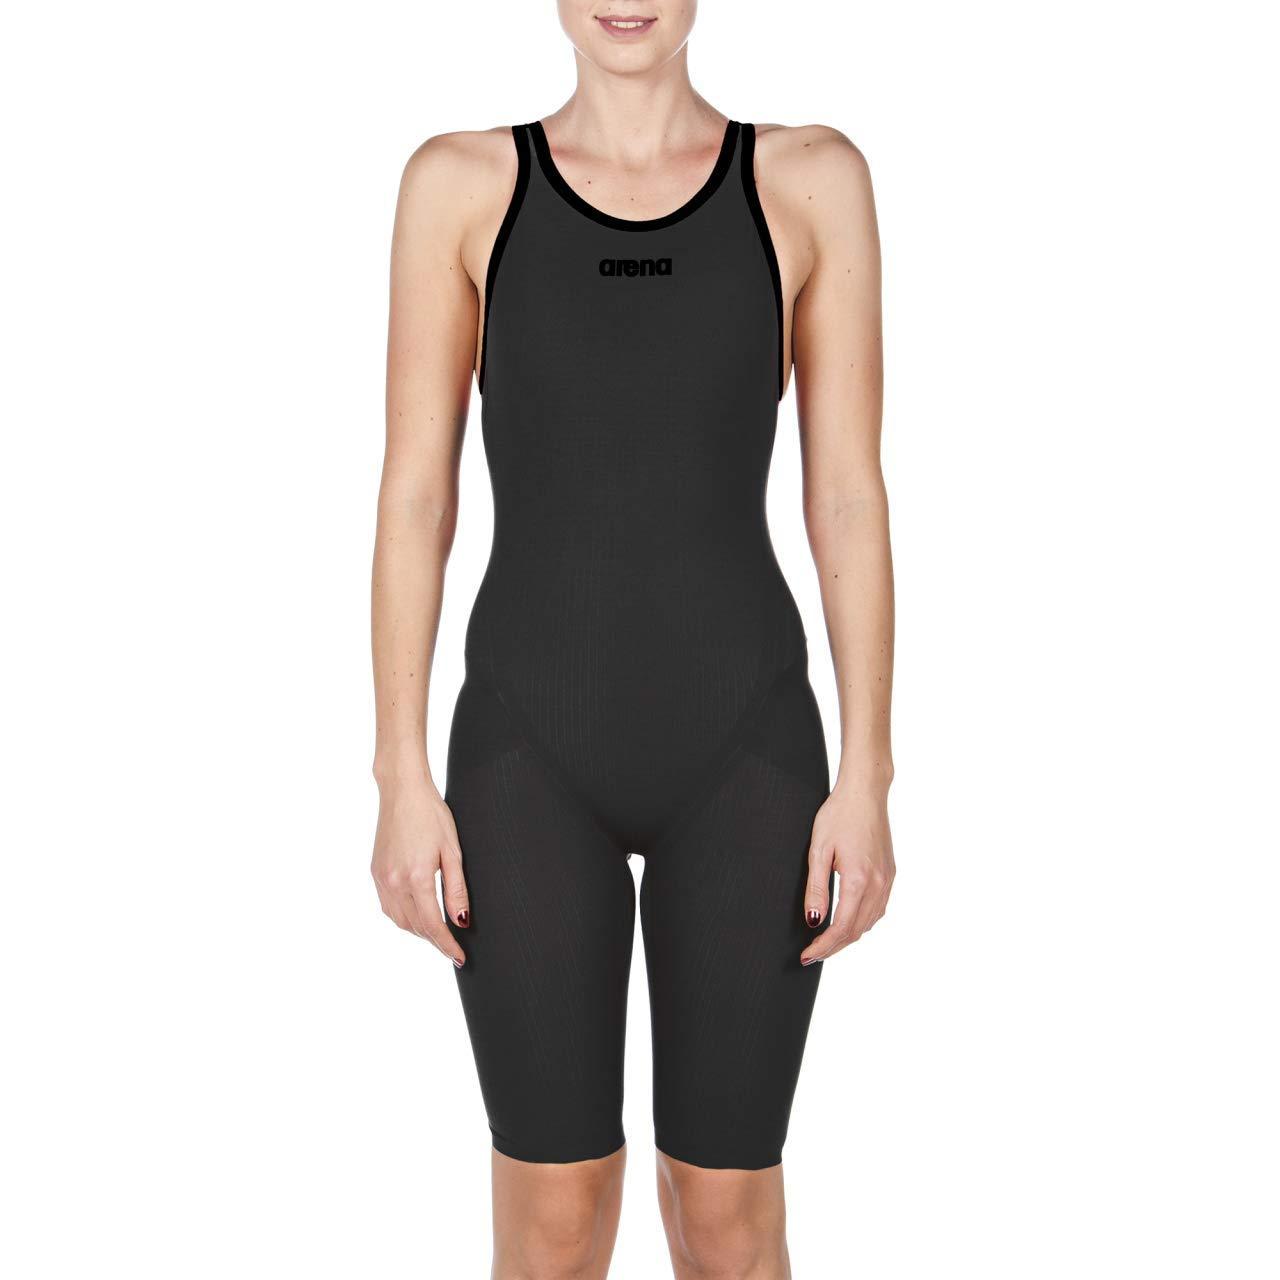 Image of ARENA Women's Powerskin Carbon Flex Vx Fbsl Open Back Racing Swimsuit Bodysuits